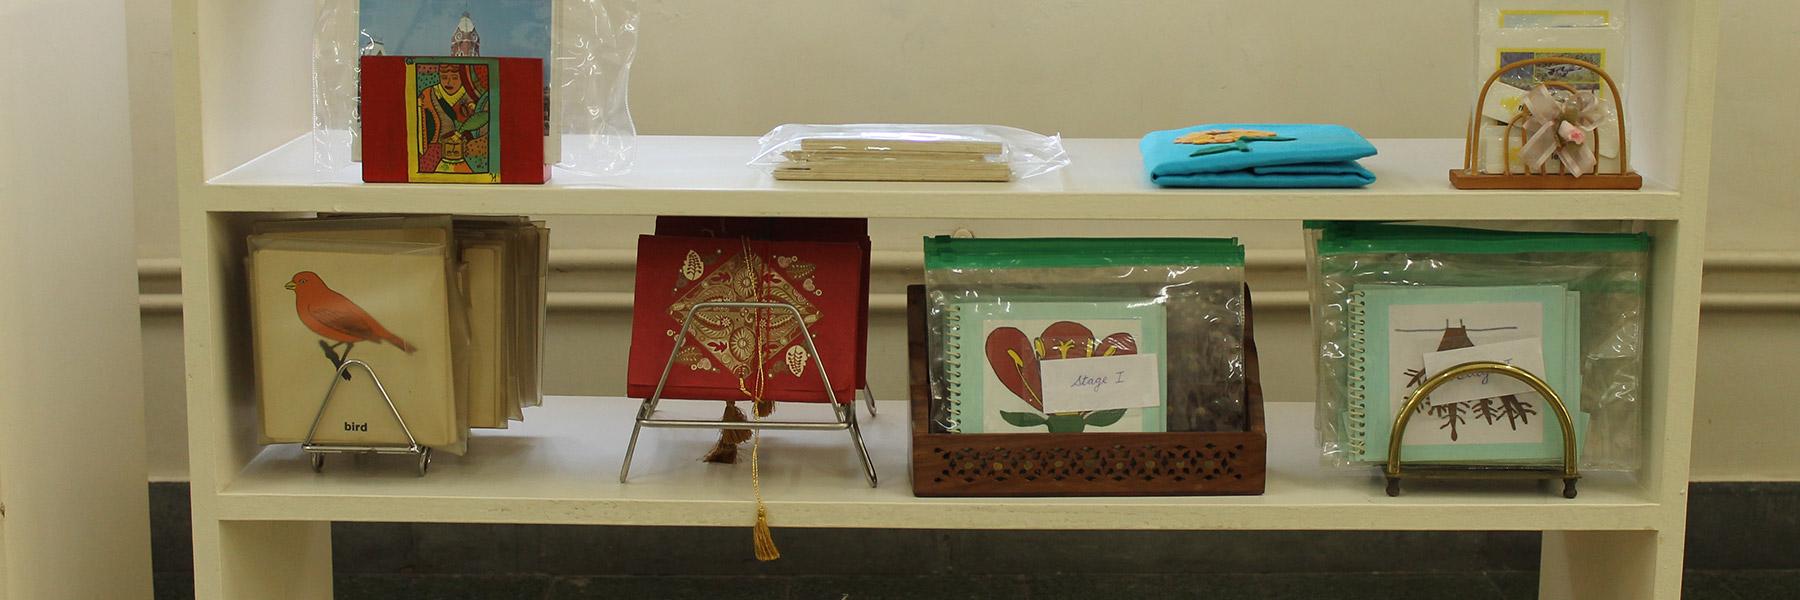 Resources for Montessori Study